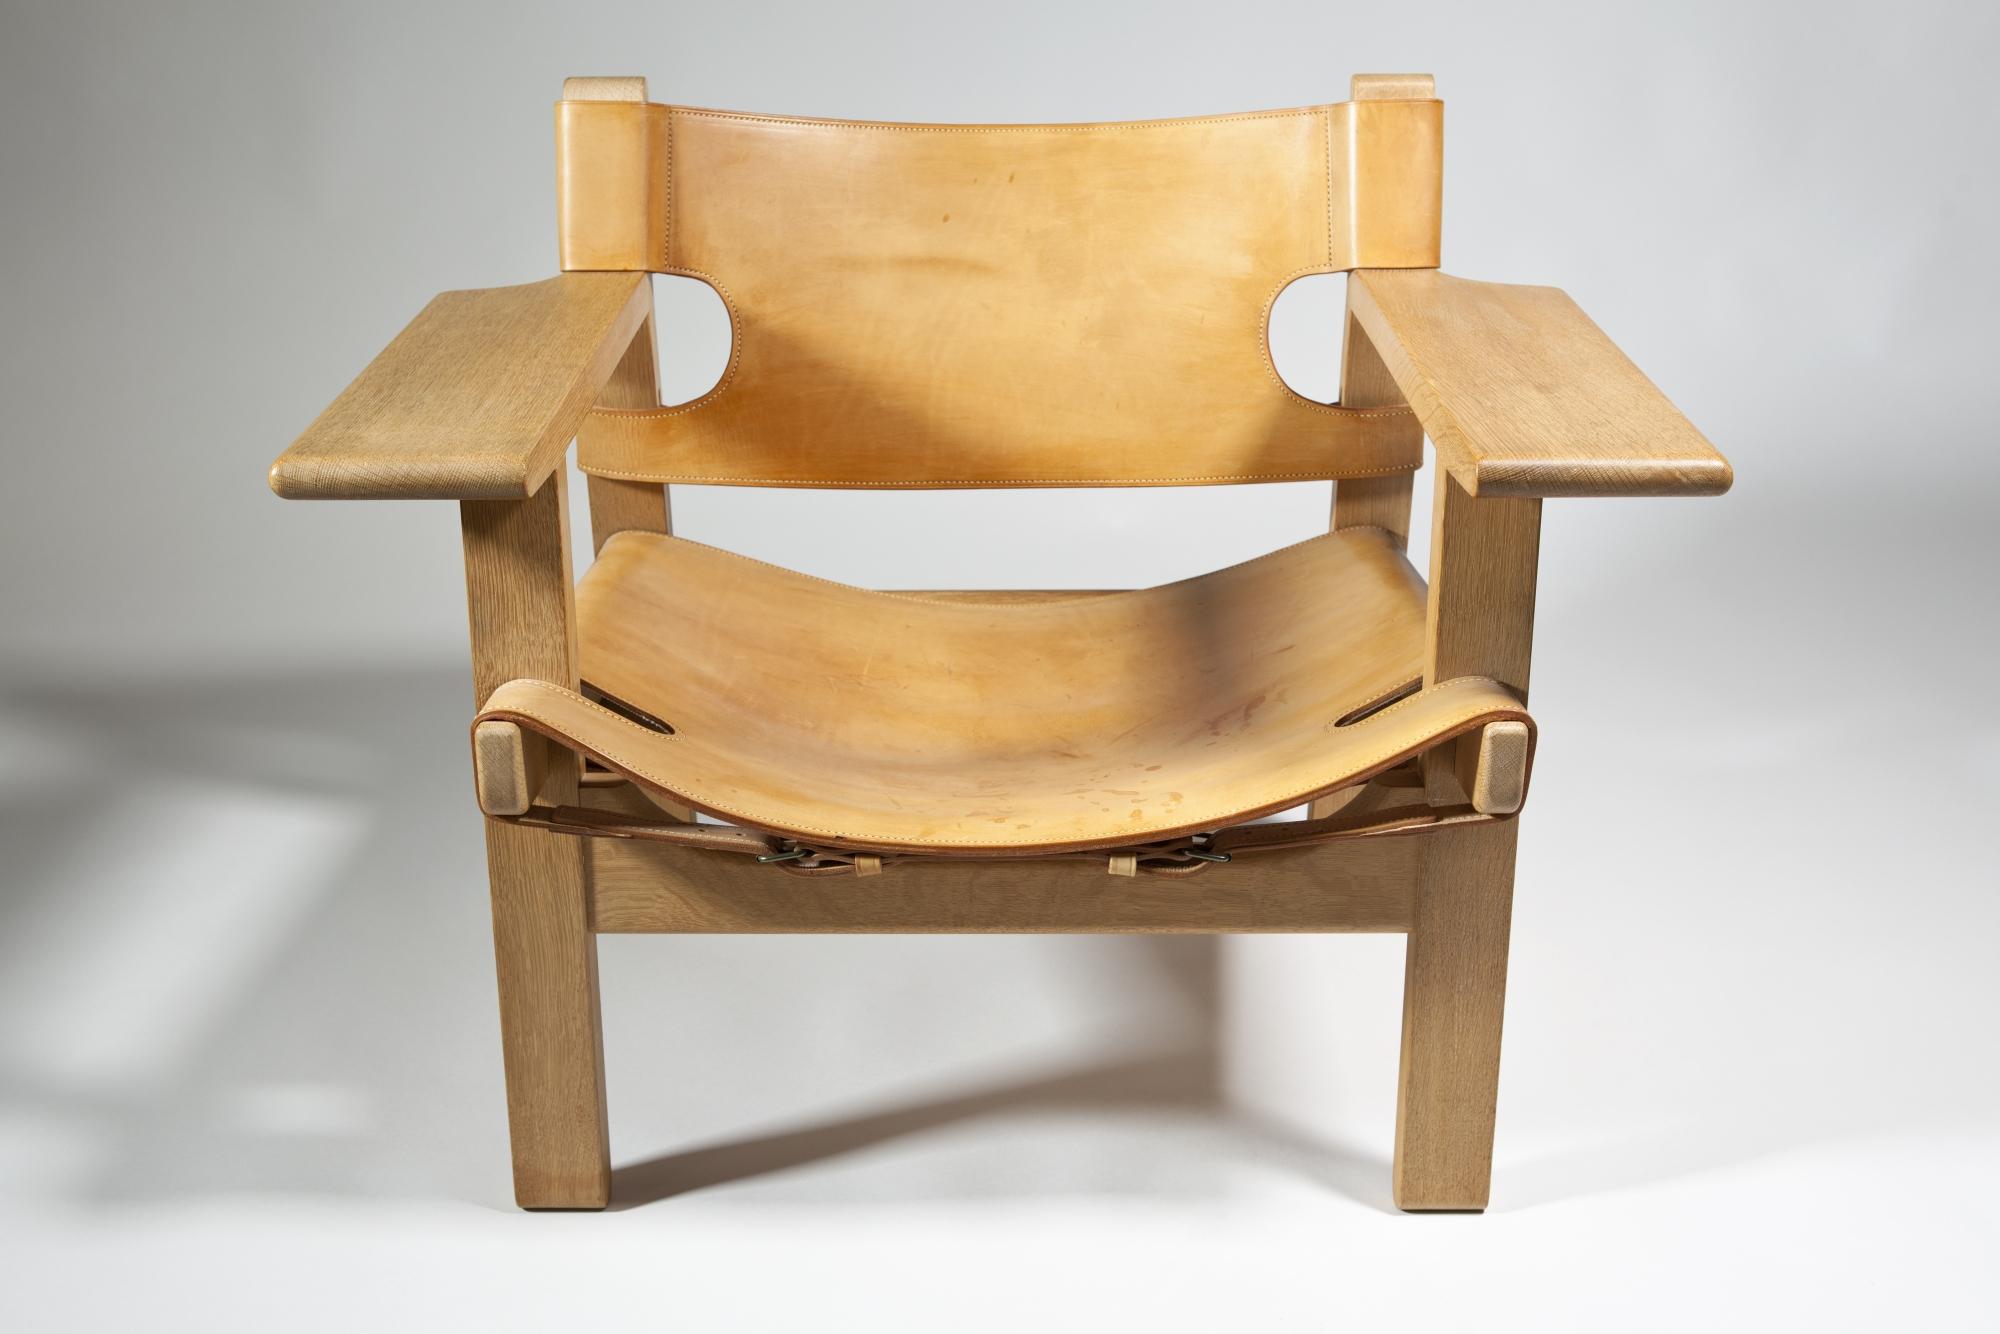 børge mogensen spanish chair design 1958 execution ca 1970 by